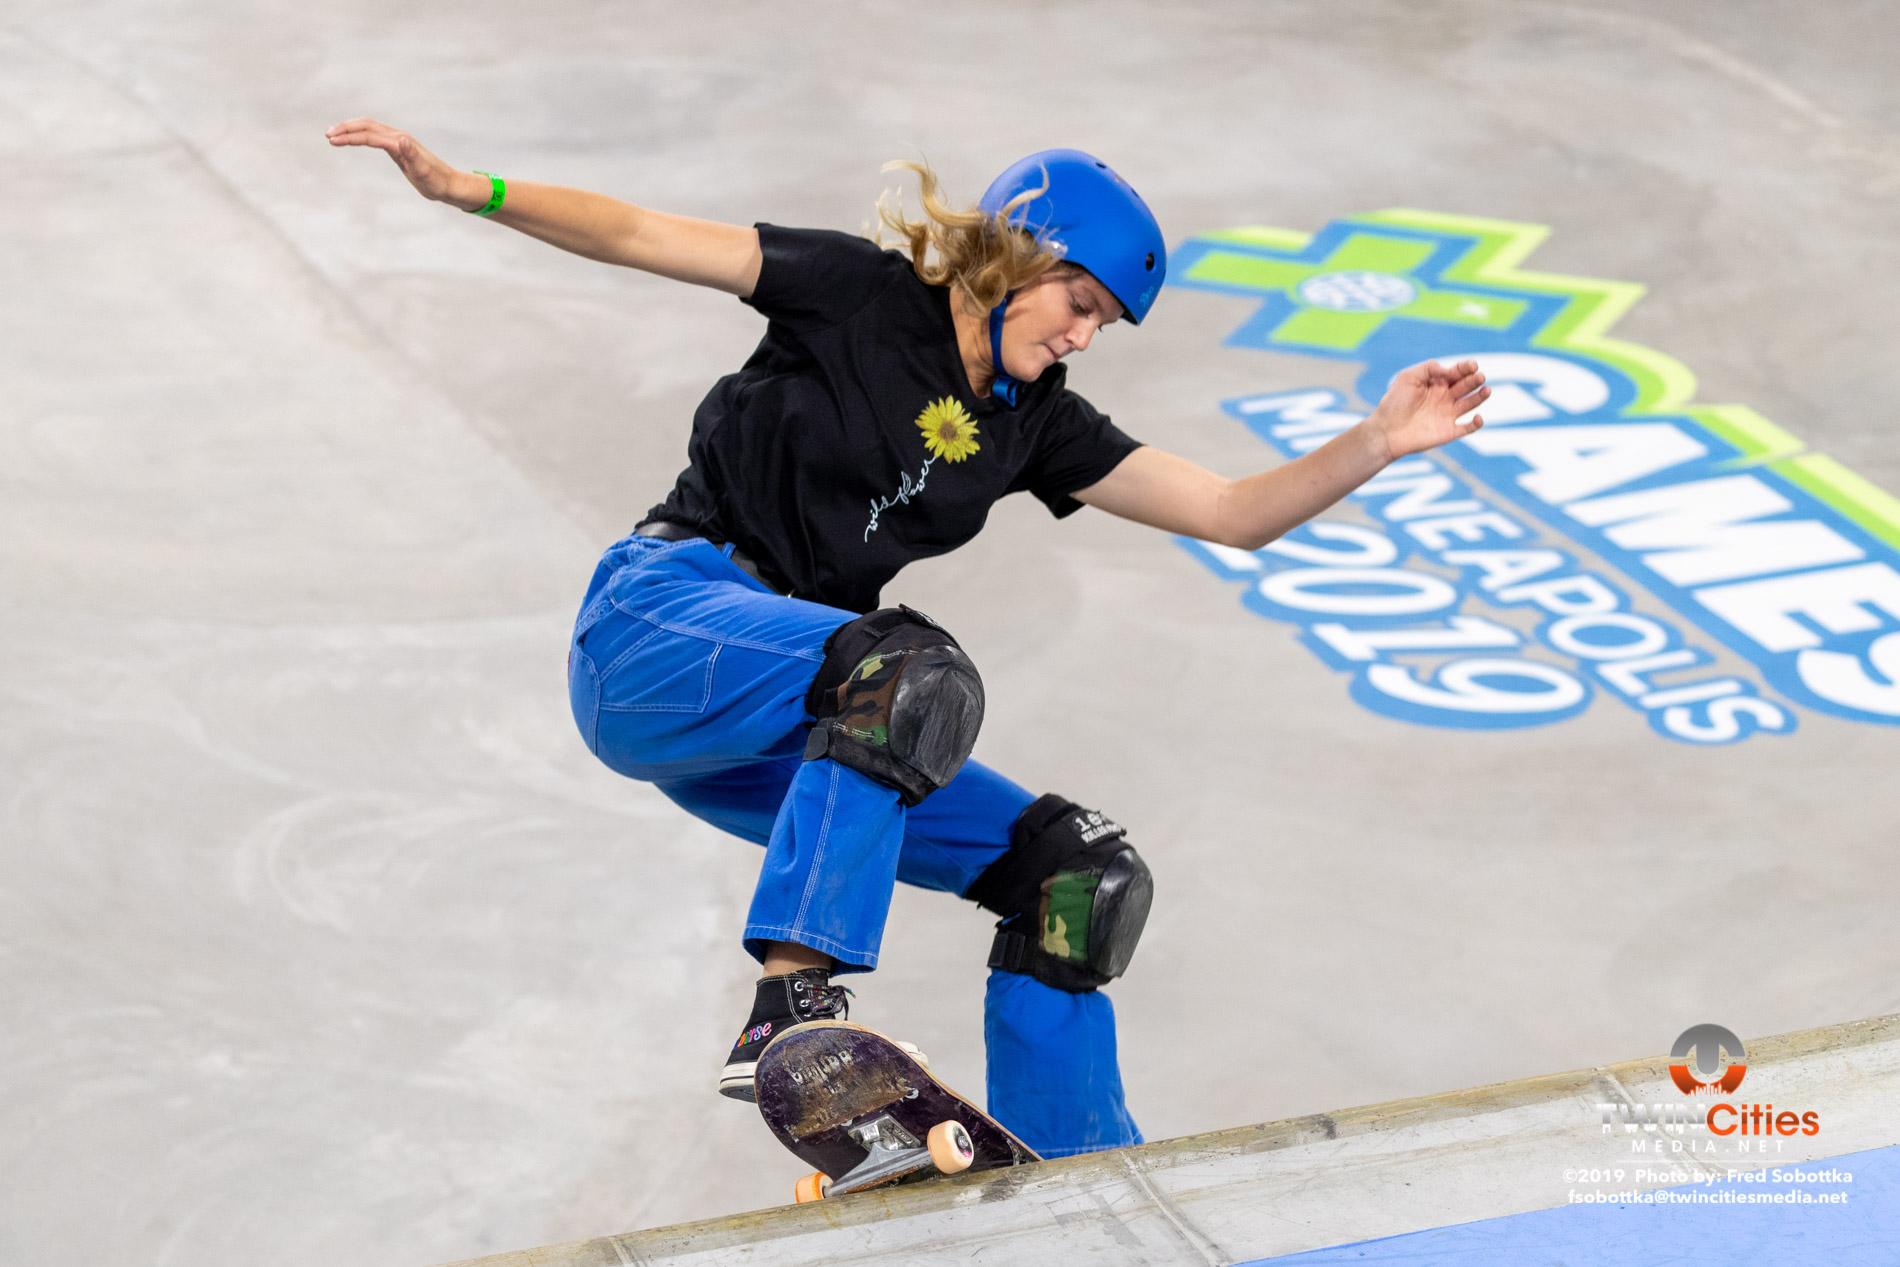 Womens-Skateboard-Park-12